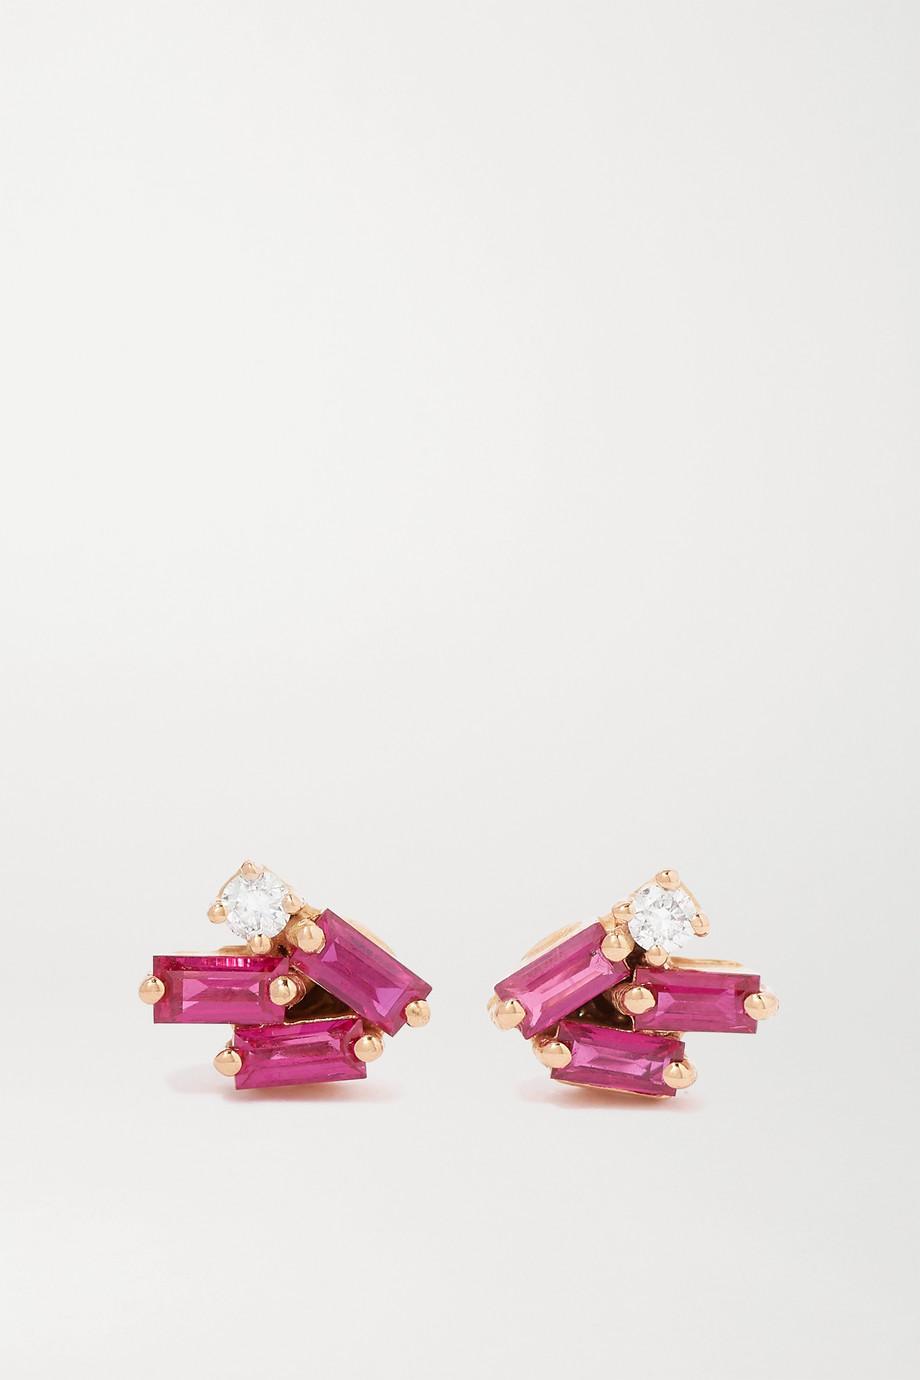 Suzanne Kalan 18K 玫瑰金、红宝石、钻石耳环